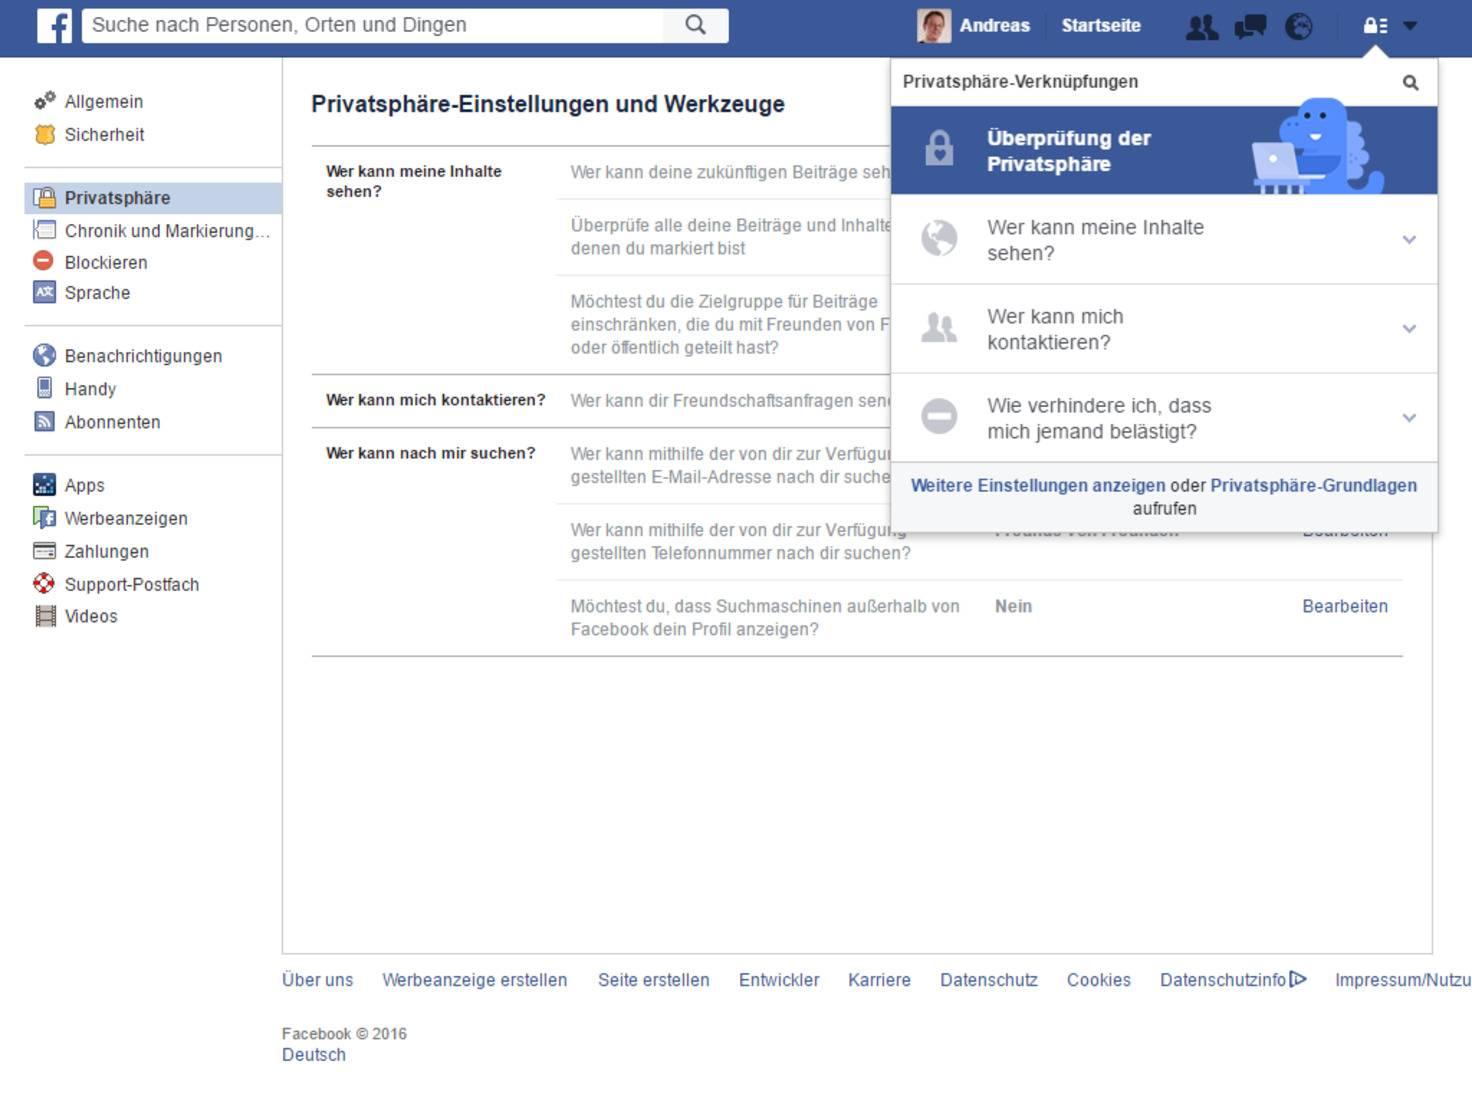 Andreas_Facebook_Sicherheit